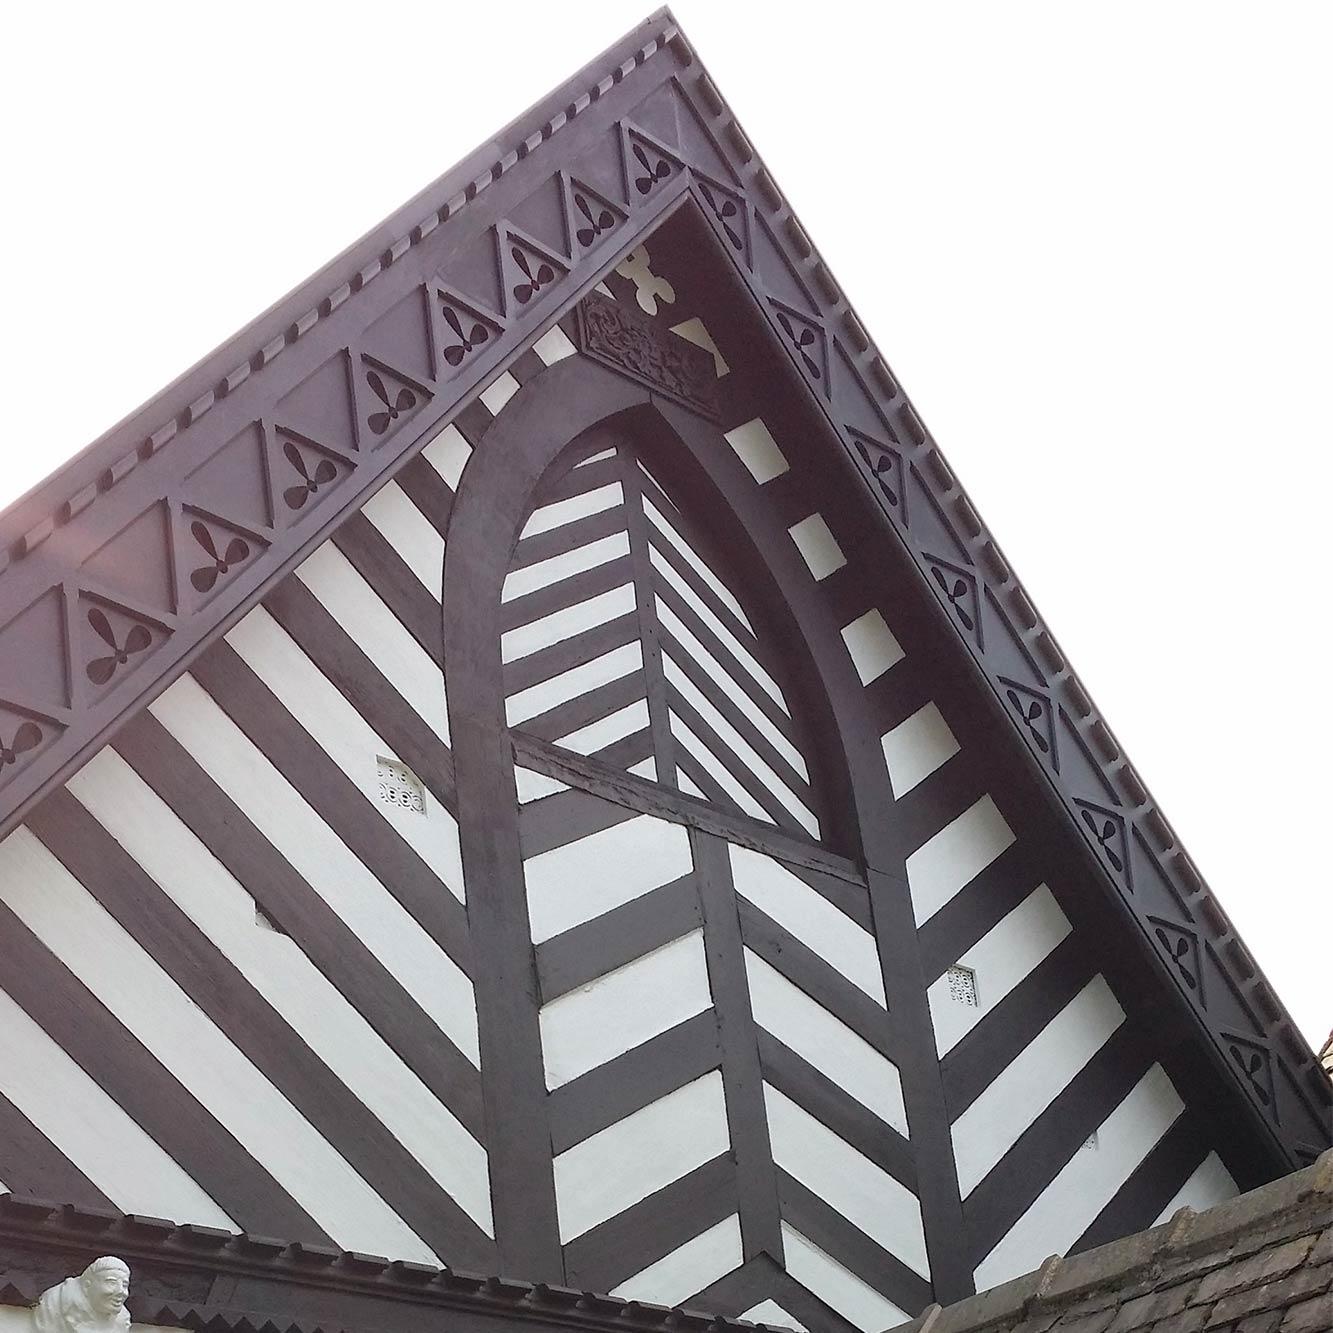 Cooper Bespoke Joinery Samlesbury Hall Preston Lancashire Stately home